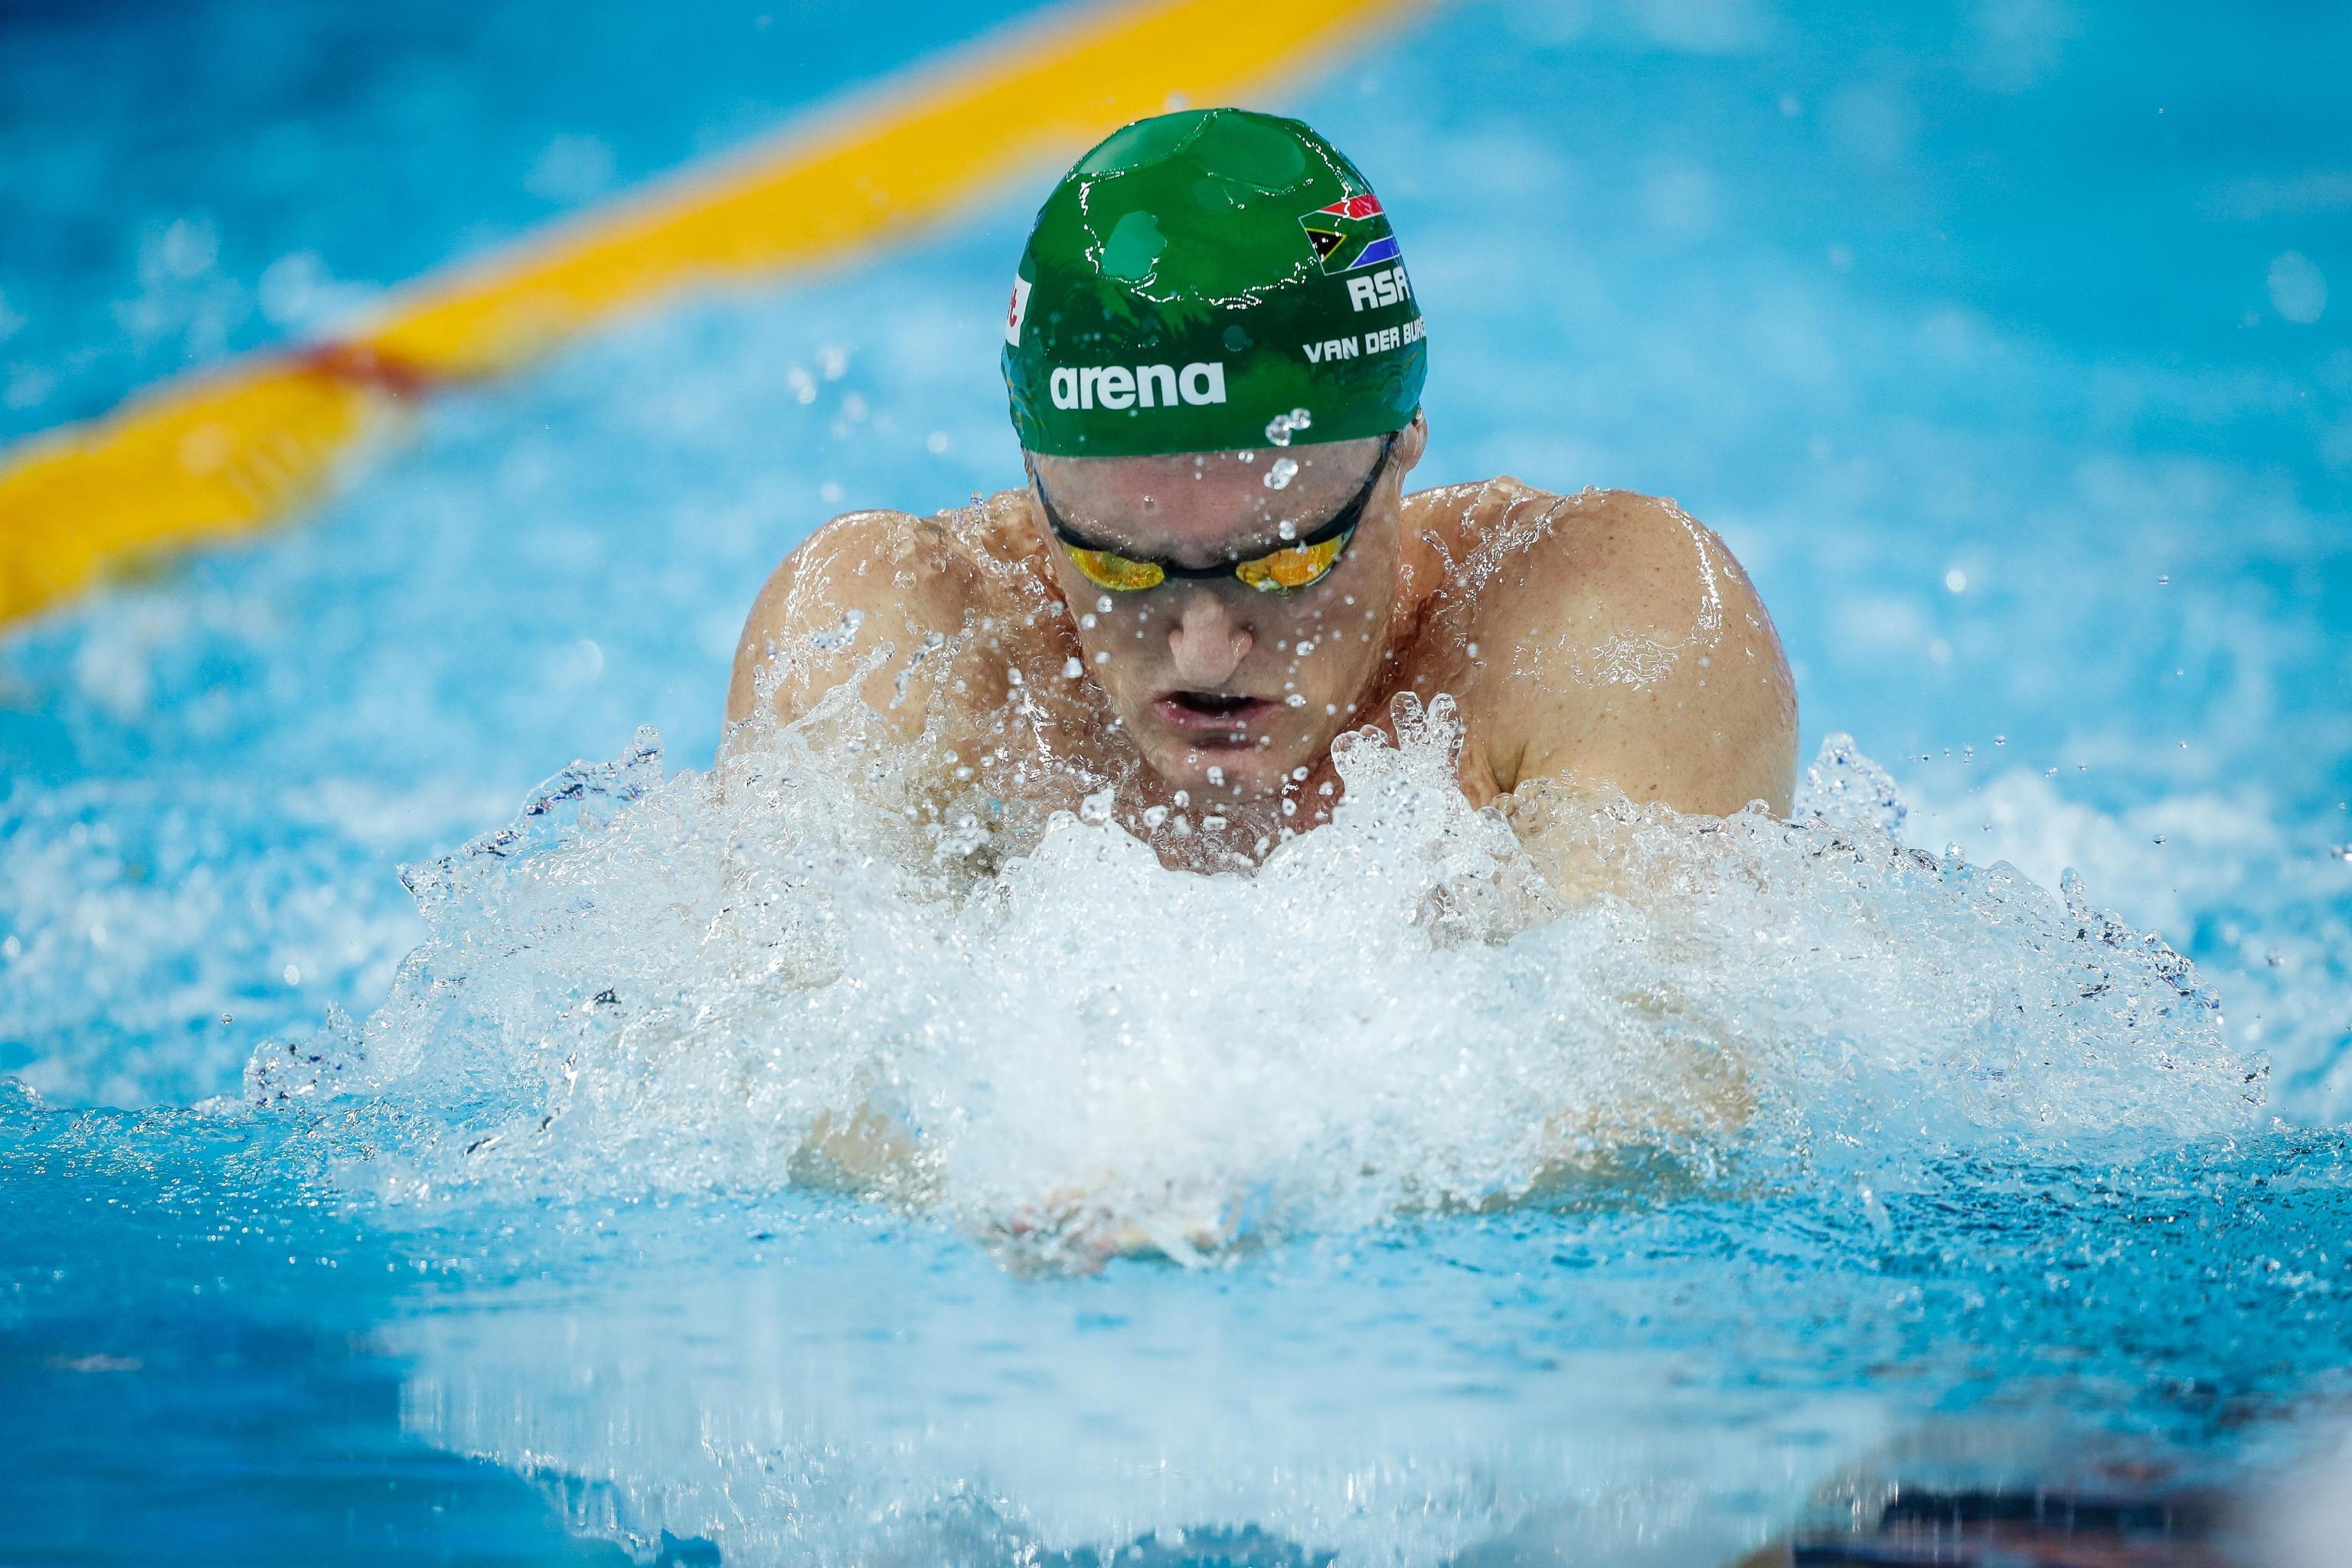 Cameron Van der Burgh (Nuoto - Sudafrica)